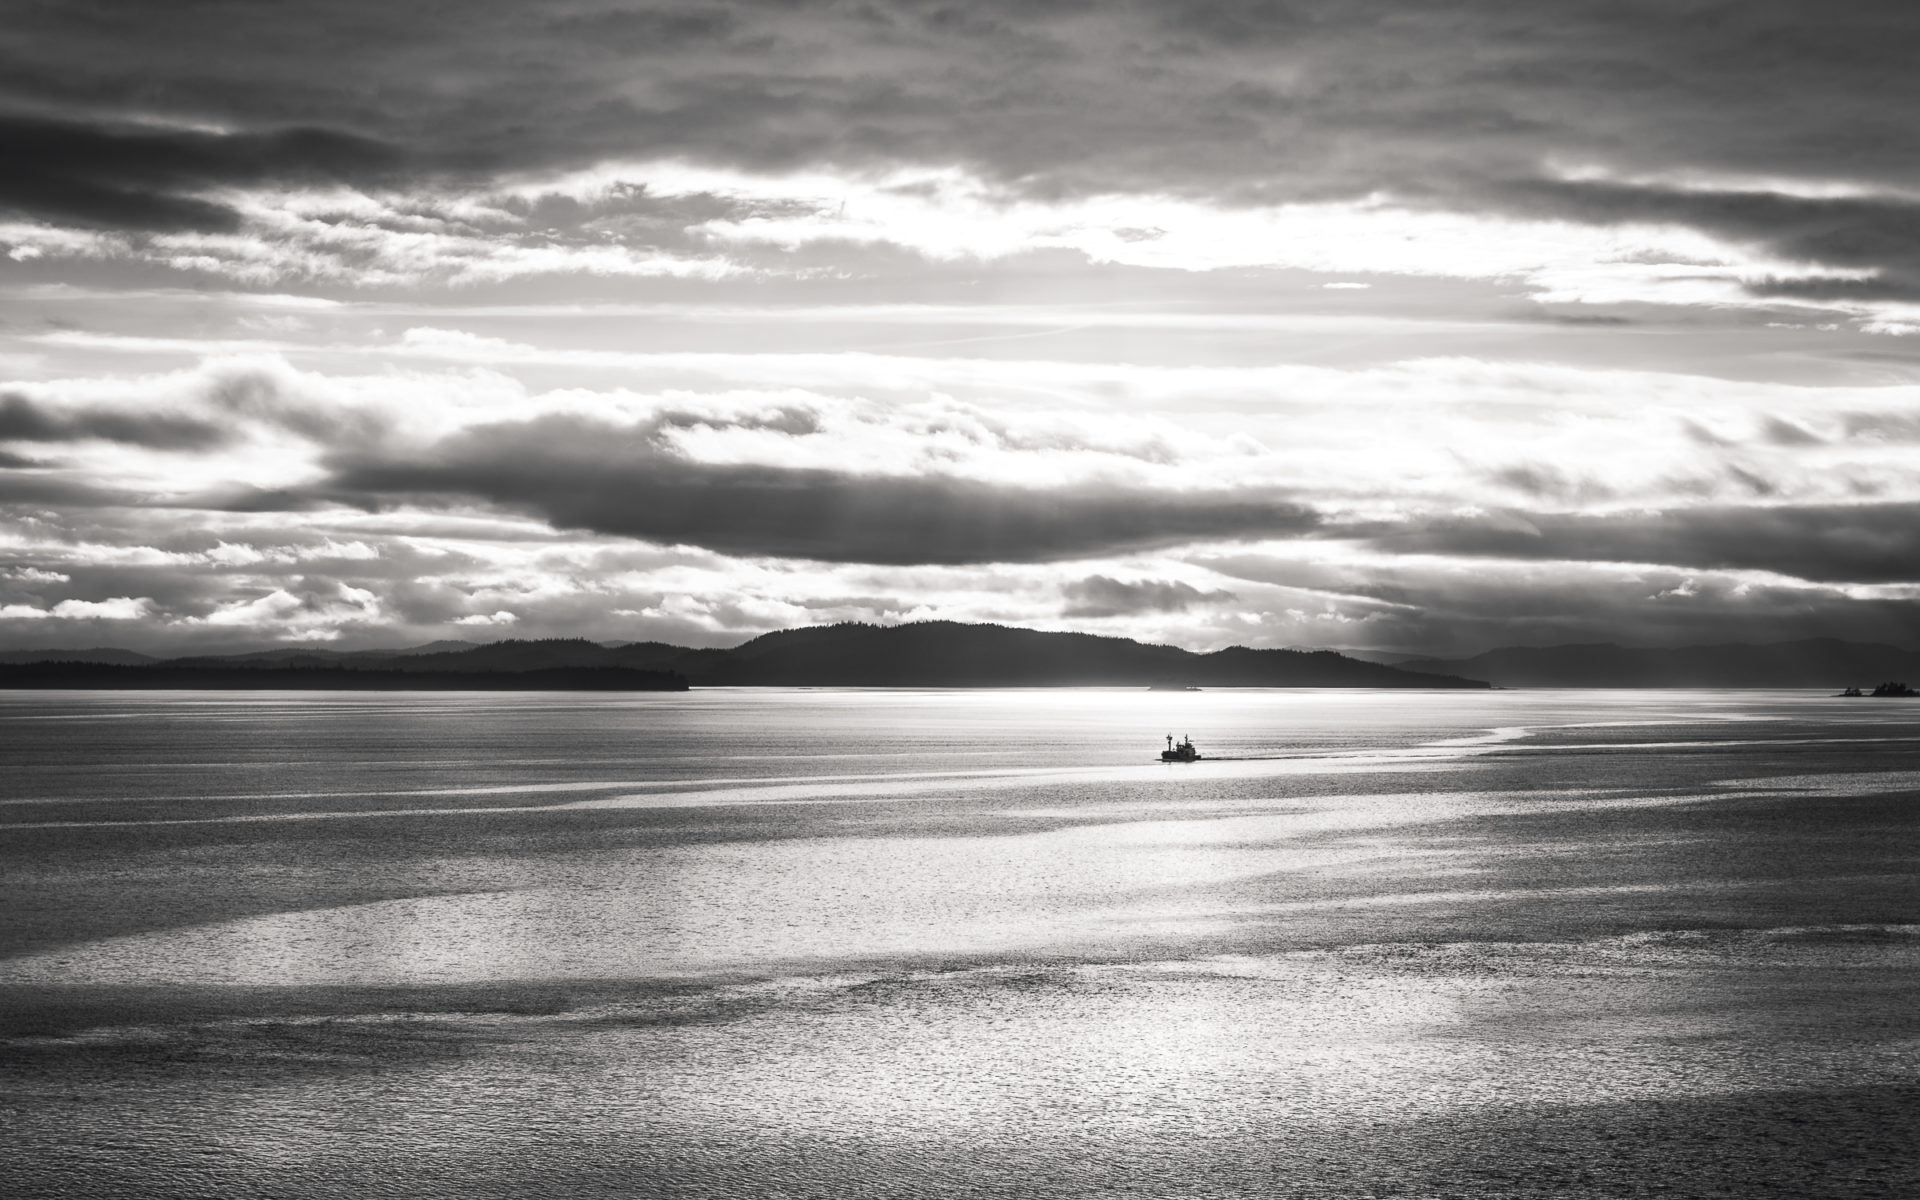 Alaskan fishing boat headed out at dawn